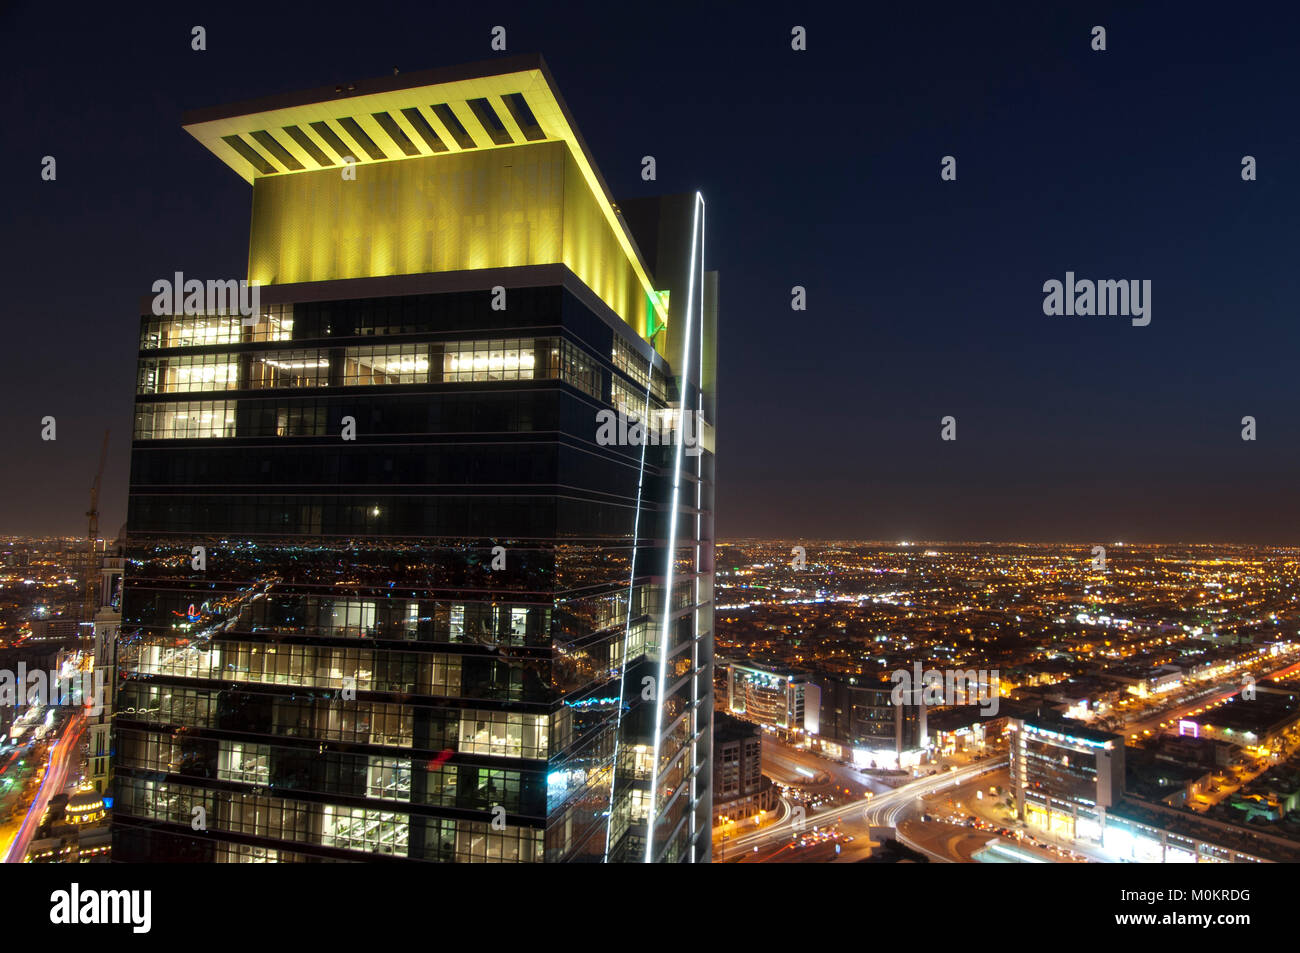 Riyadh skyline at night - Stock Image